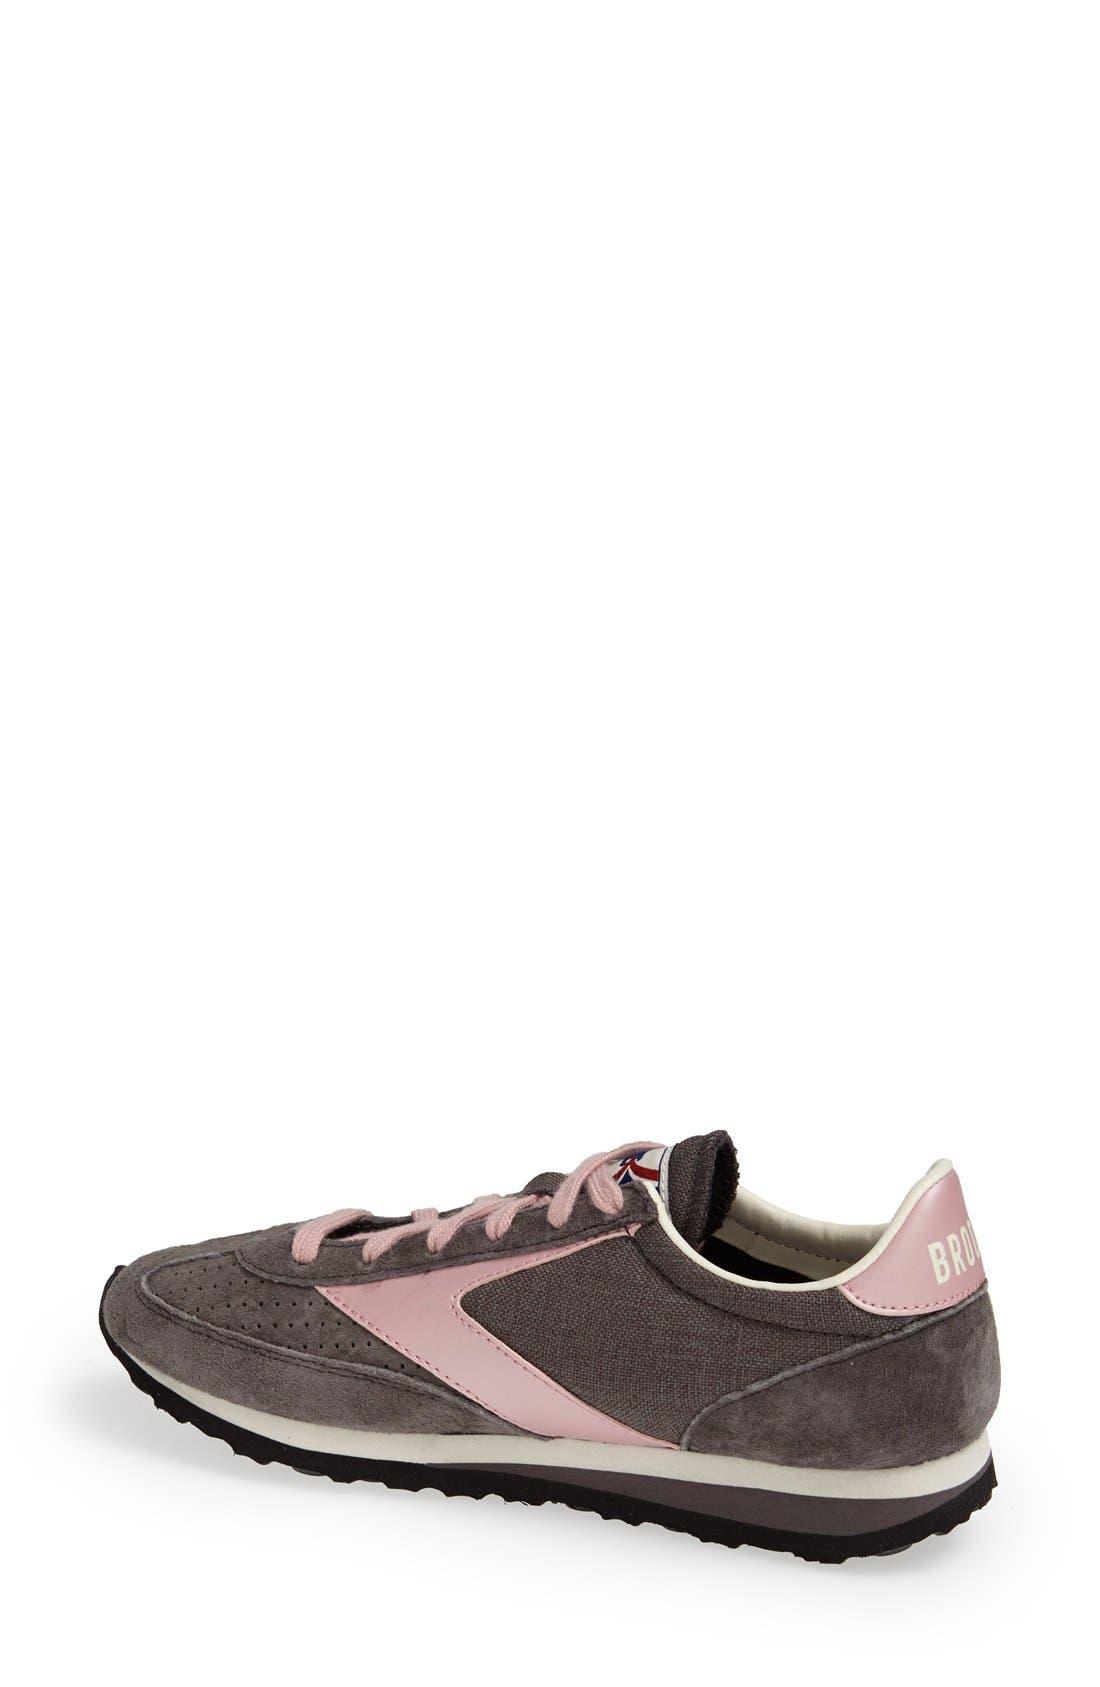 'Vanguard' Sneaker,                             Alternate thumbnail 155, color,